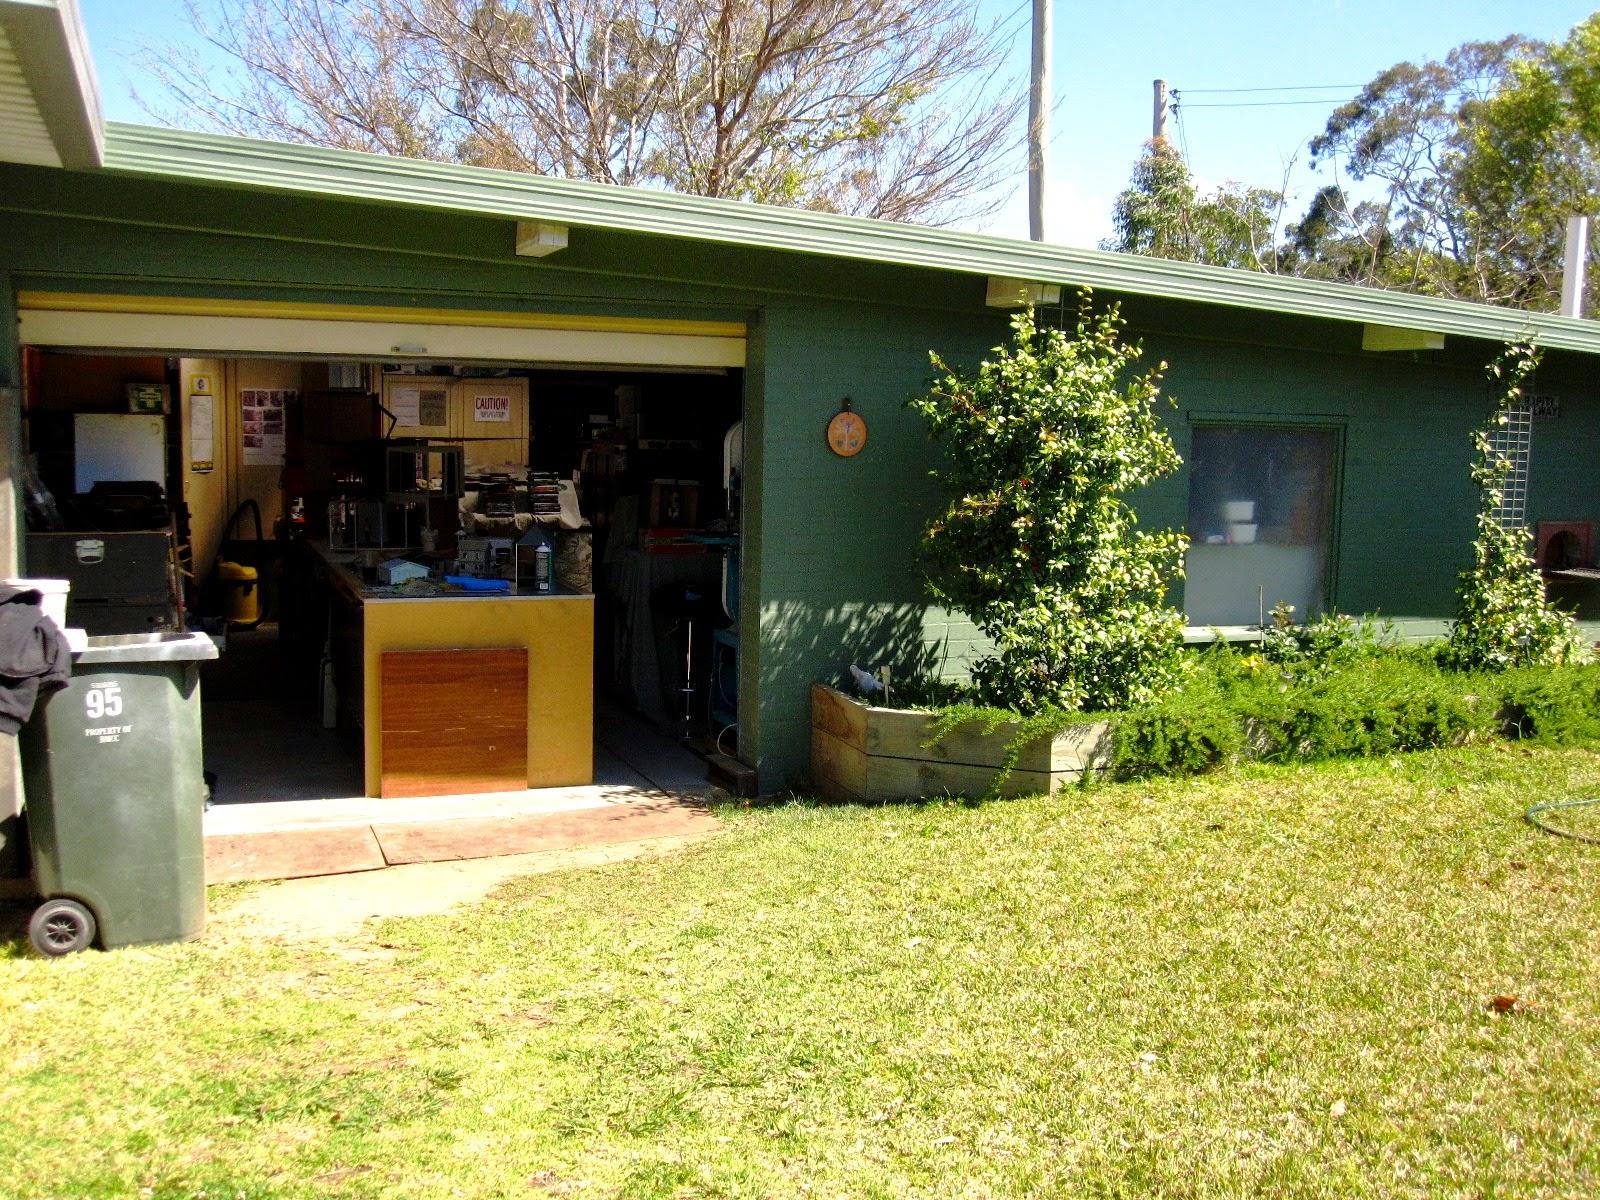 Garage workshop in a back yard.